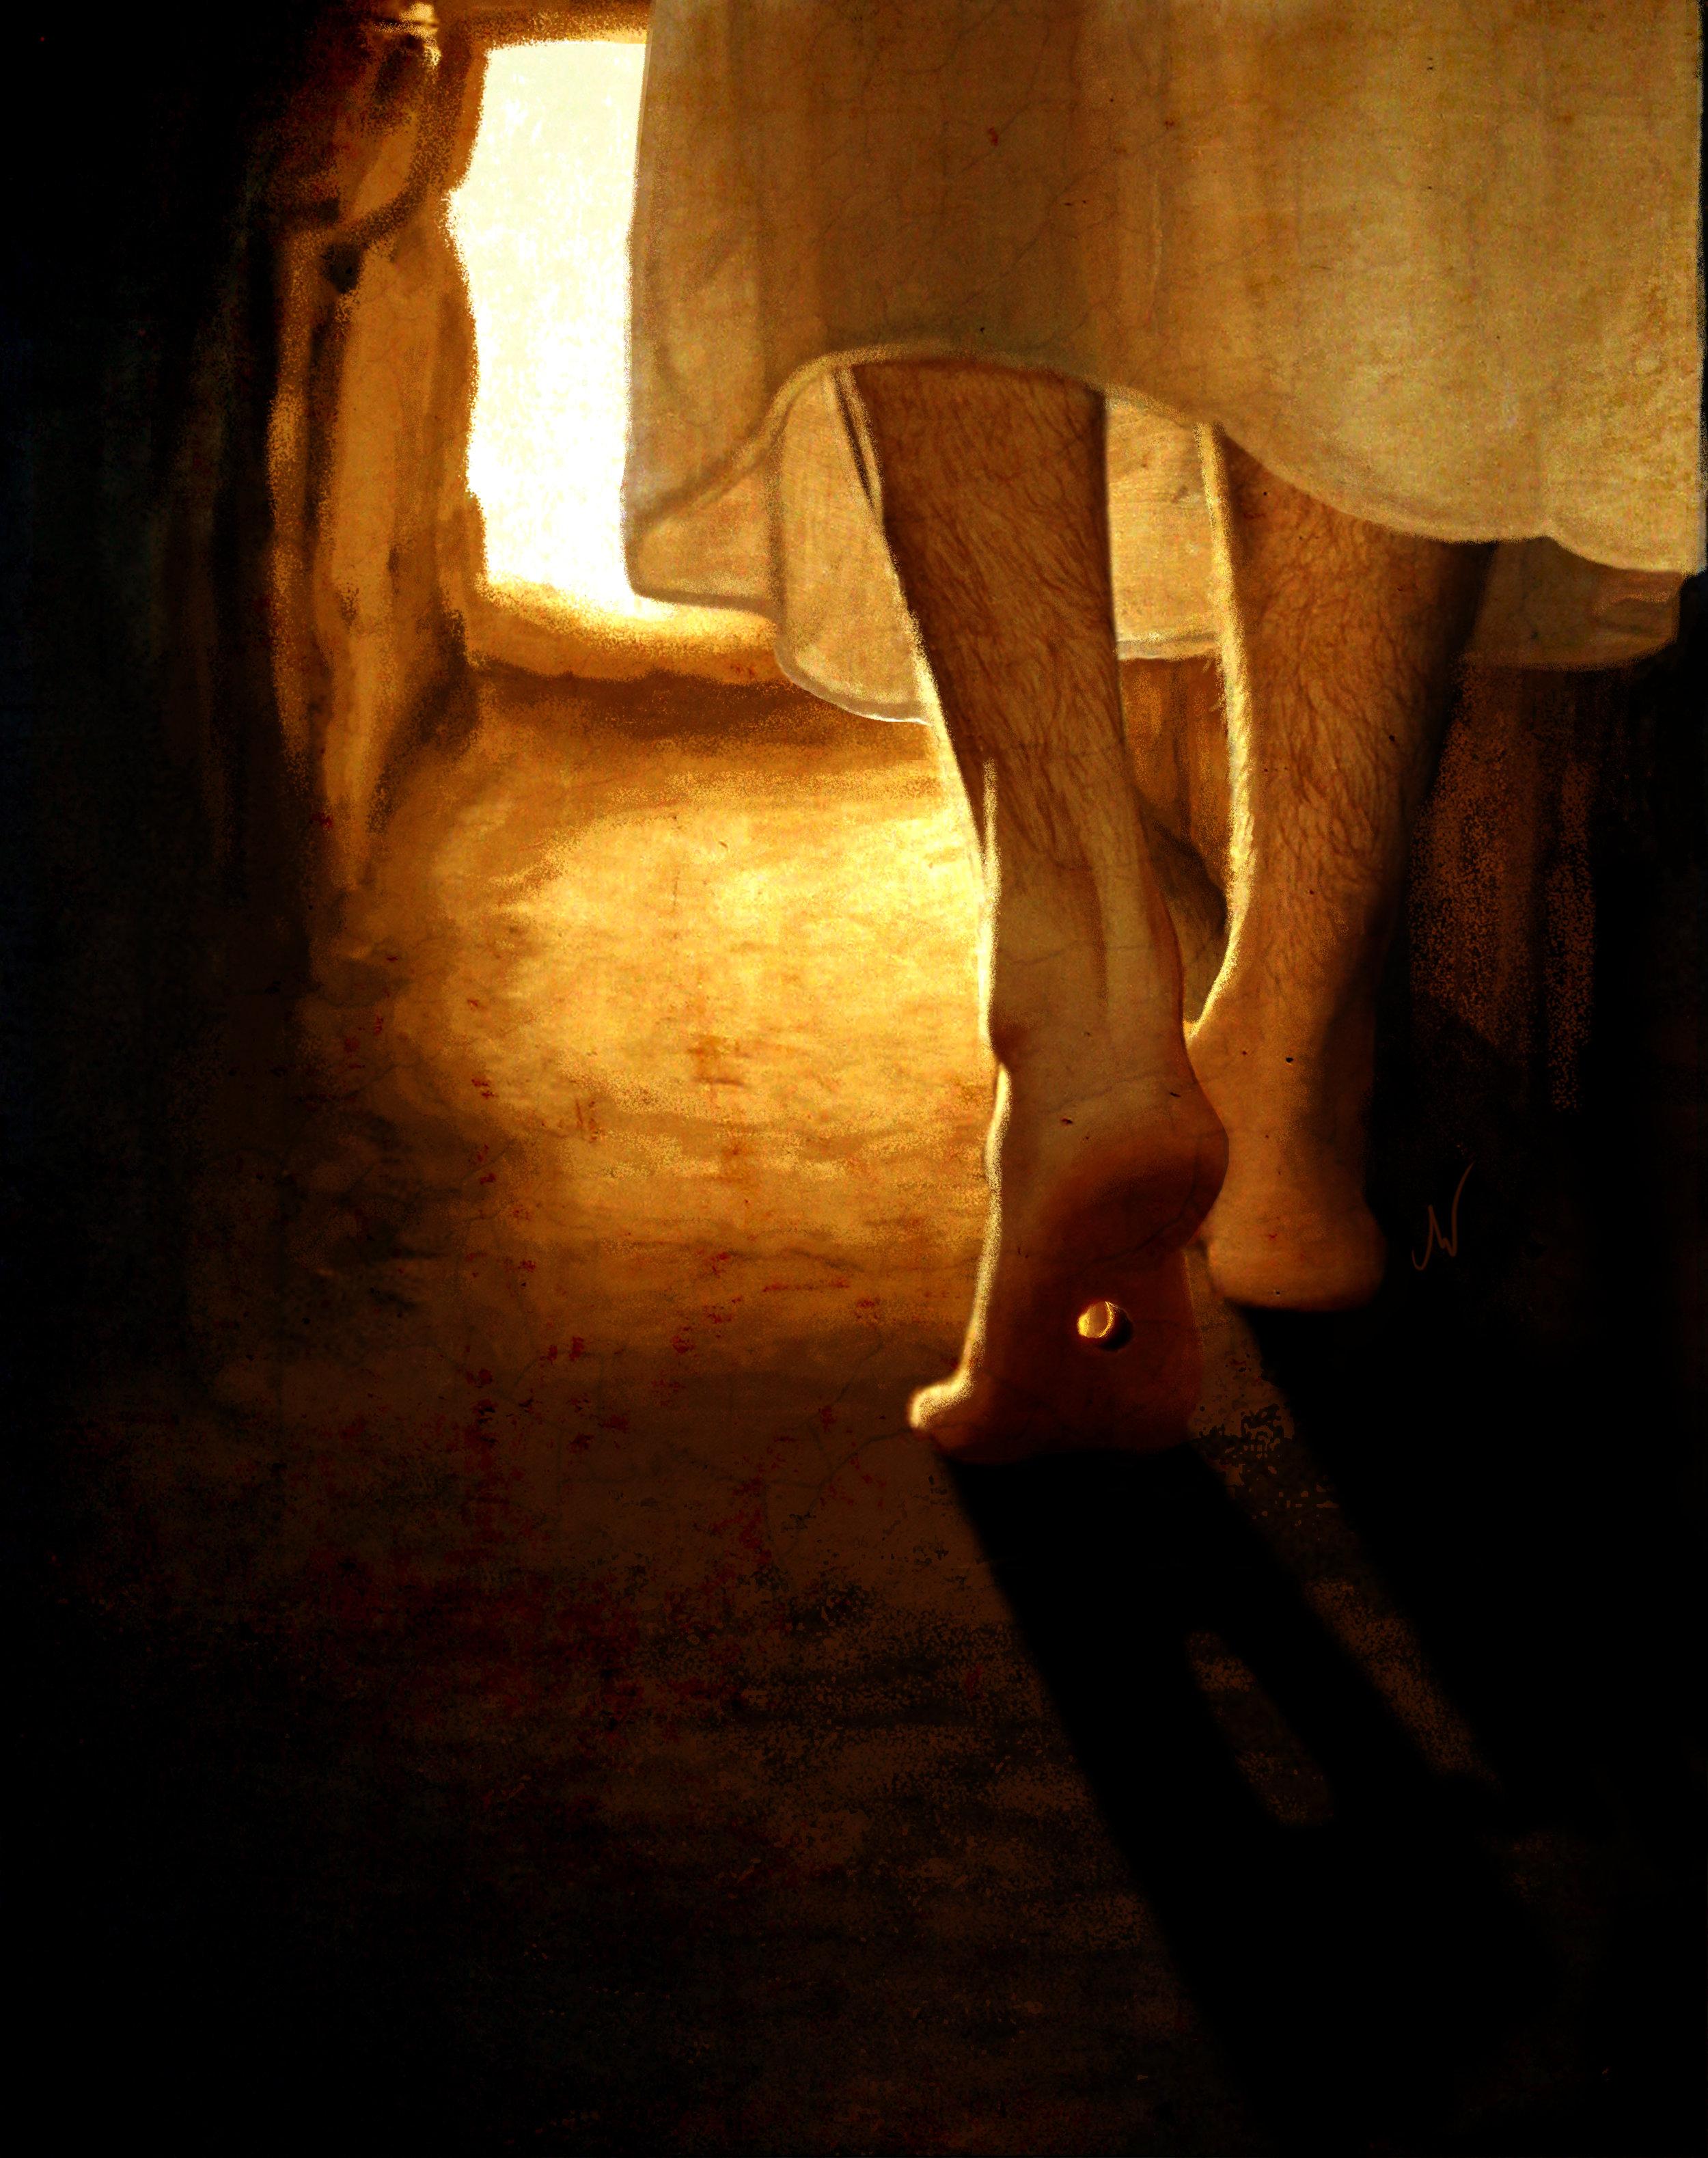 Risen-Christ with hole.jpg